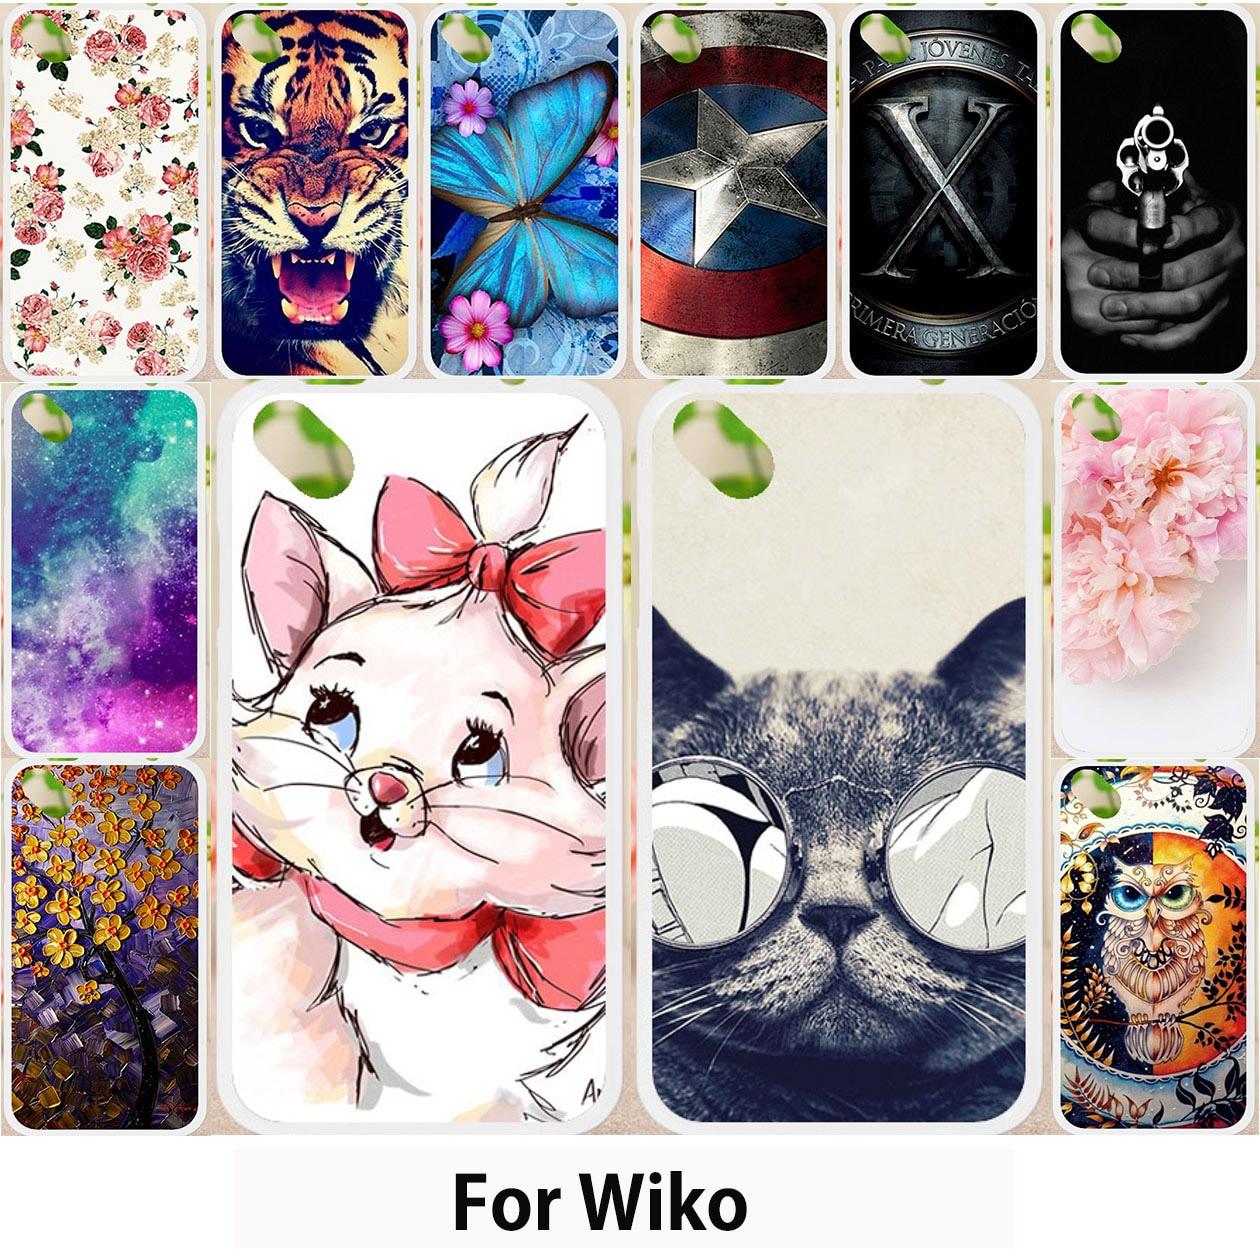 Vanveet Cases For Wiko Sunny 2 Plus MAX Case Wiko Lenny 3 4 MAX Plus Jerry 2 Harry Freddy Kenny Rainbow Jam 3G Ridge 4G S-Kool